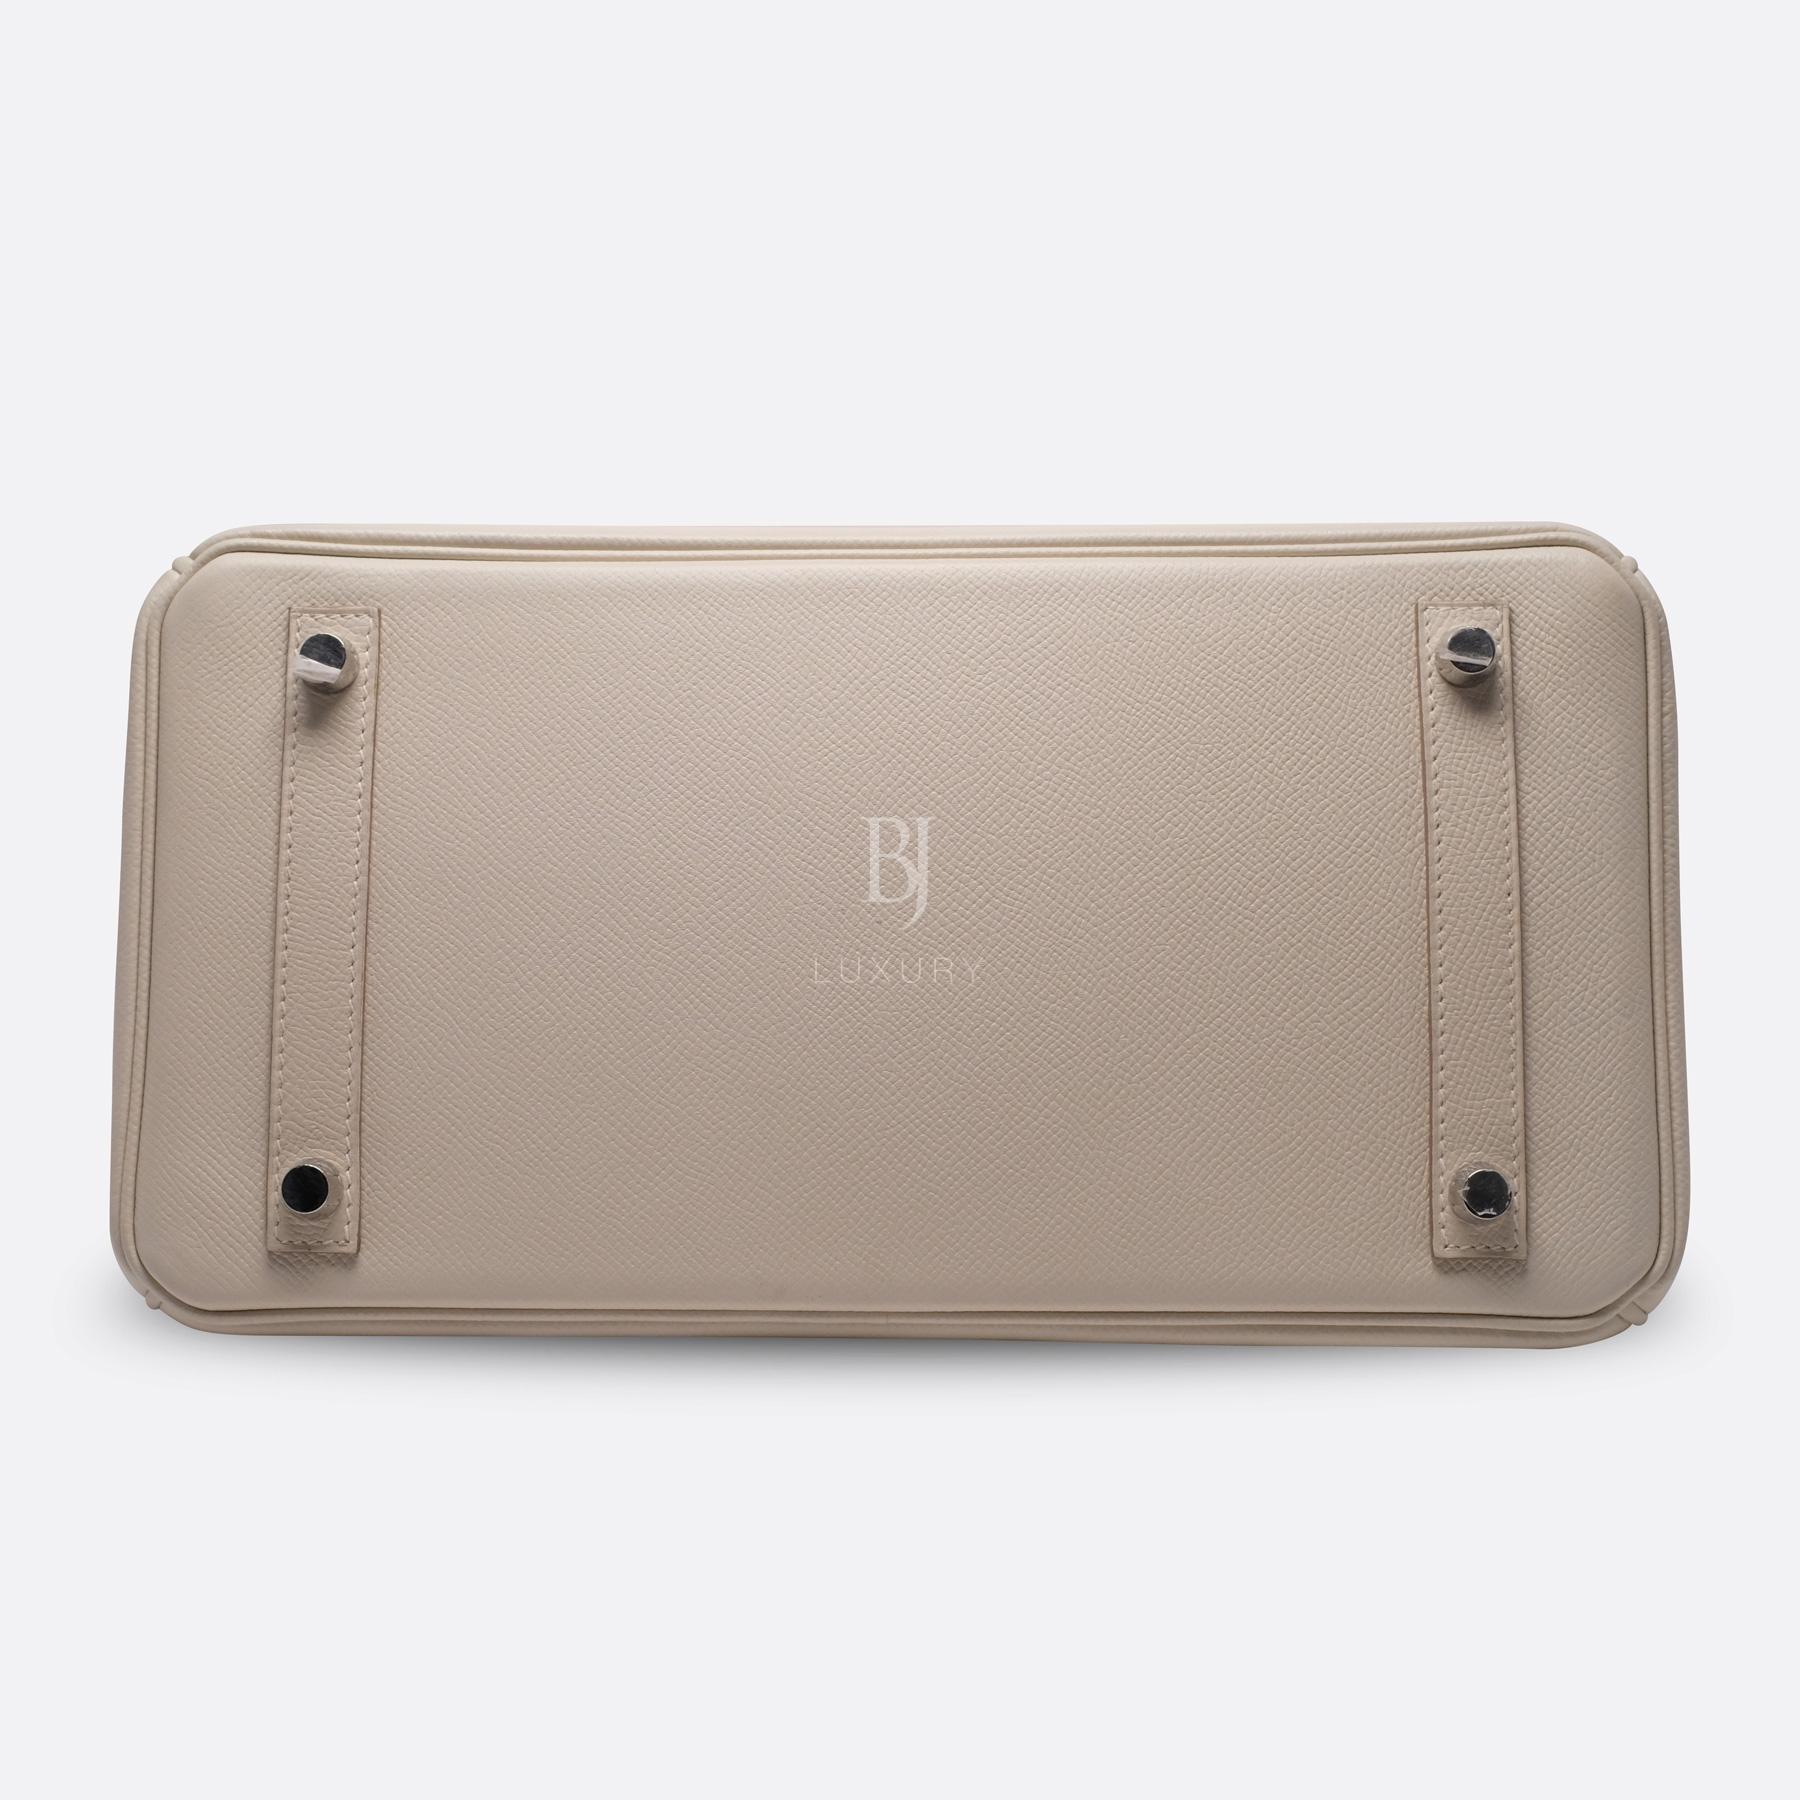 Hermes Birkin 30 Epsom Craie Palladium BJ Luxury 12.jpg